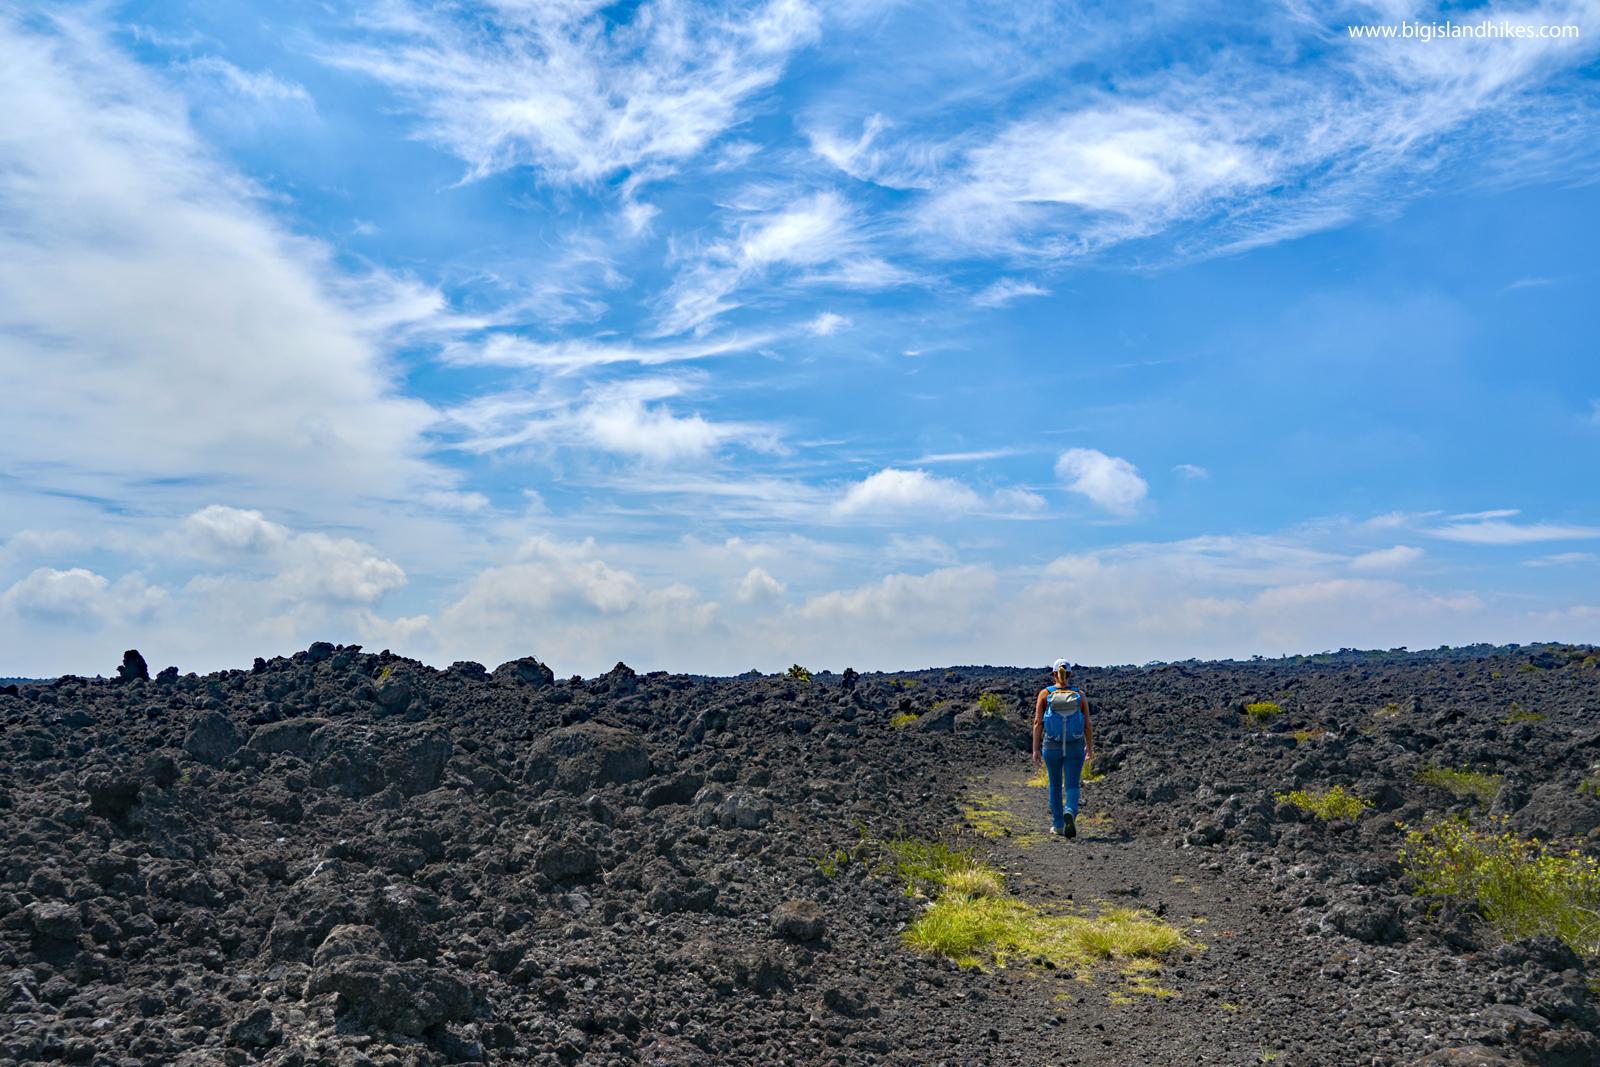 Hiking through lava